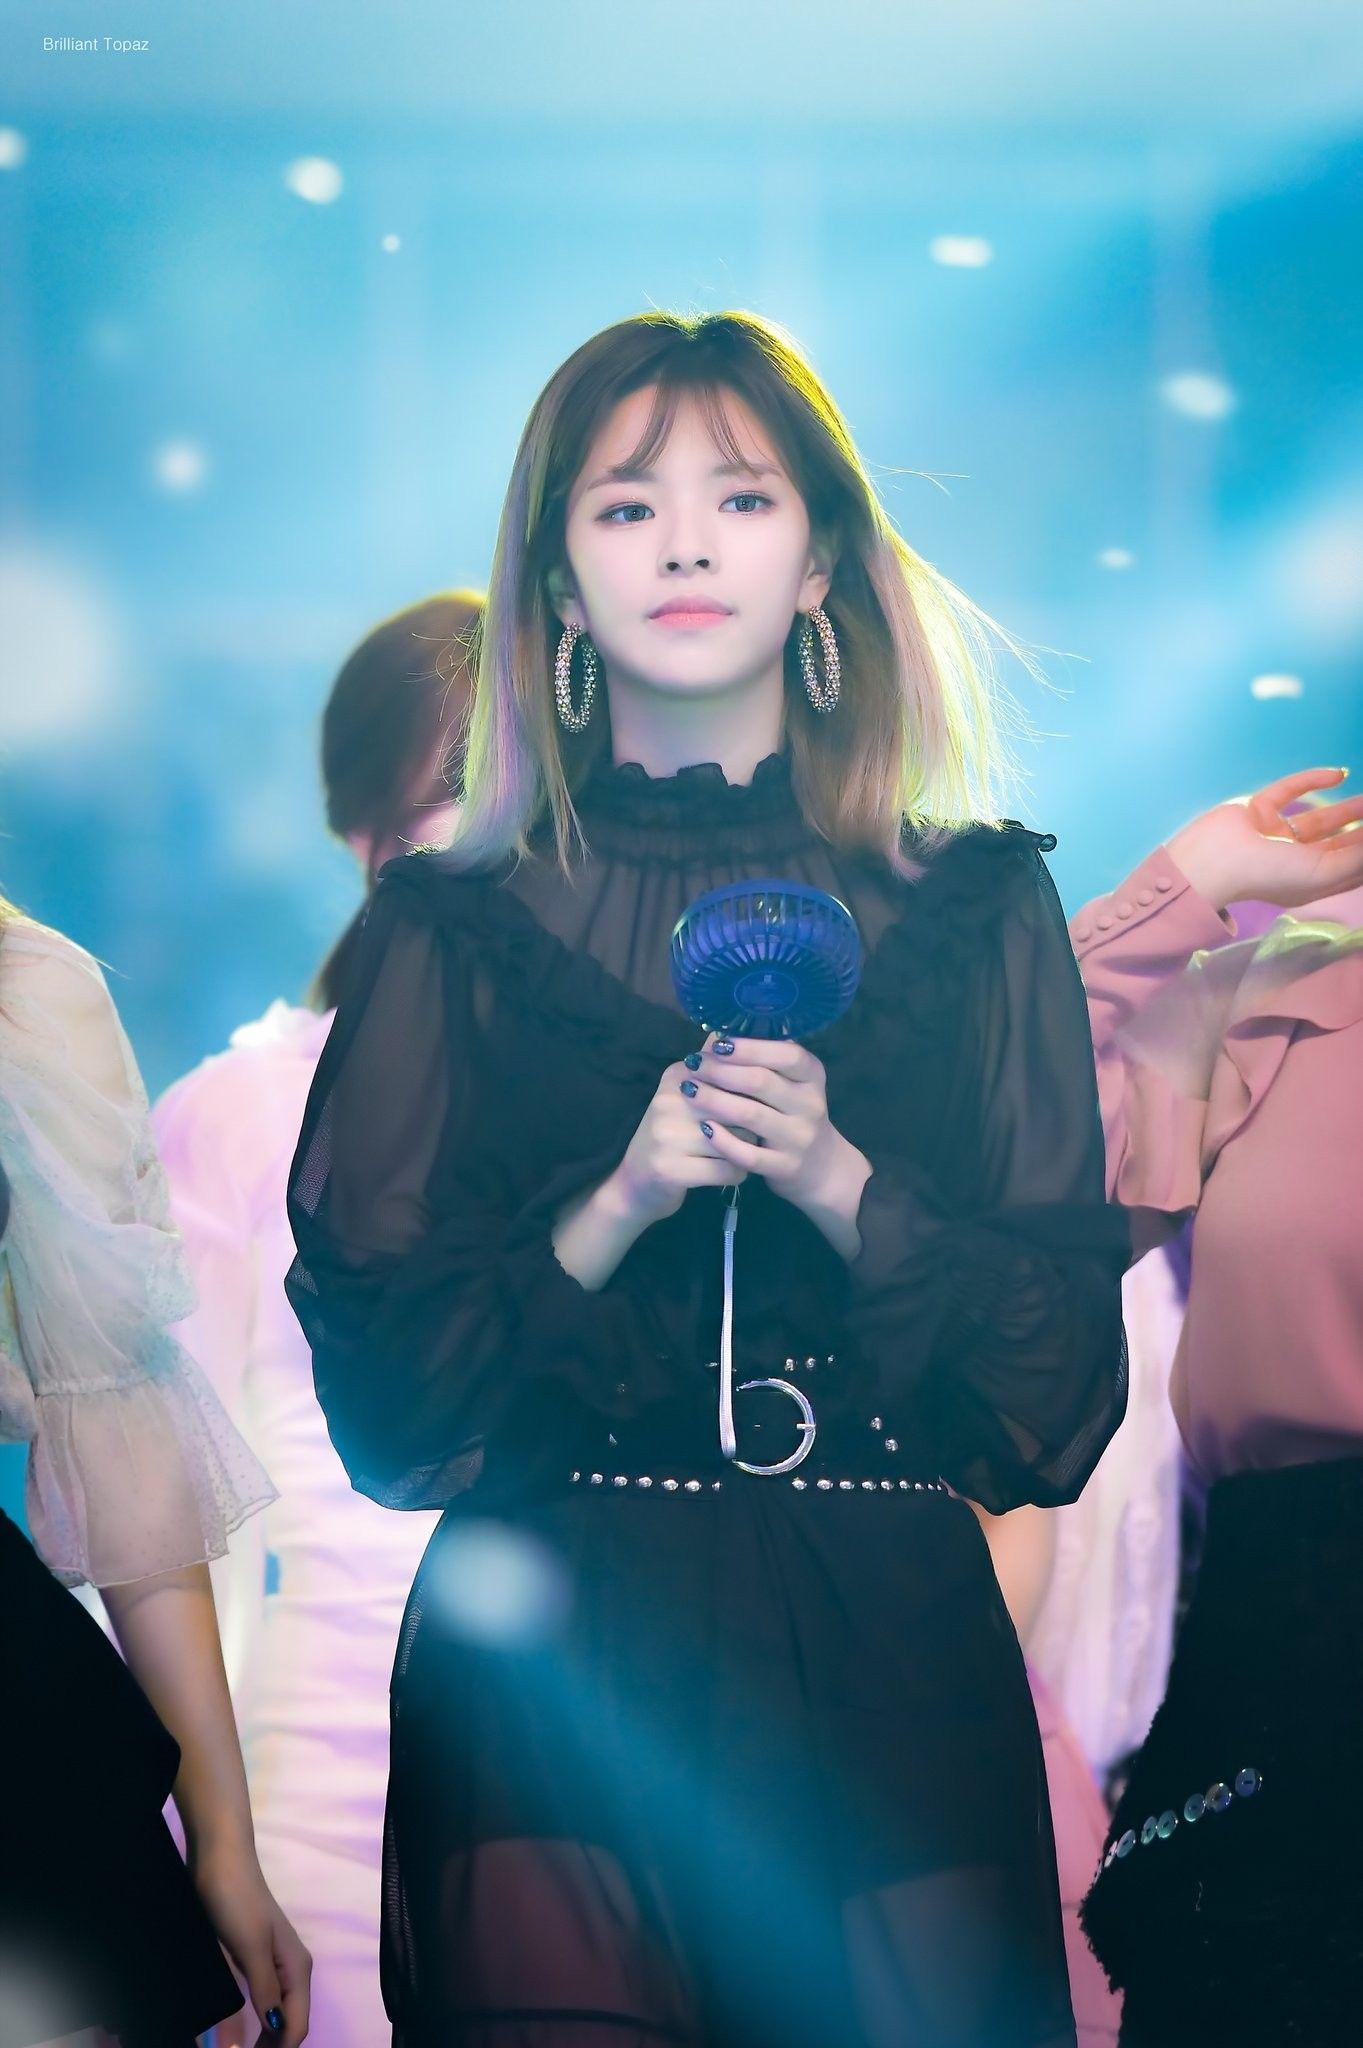 b4a33a87697b3e91f76805b310bedd76_twice-jeongyeon-181106-gma-2018-t-w-i-c-e-in-2019-kpop-nayeon-twice-jeongyeon-long-hair-2019_1363-2048